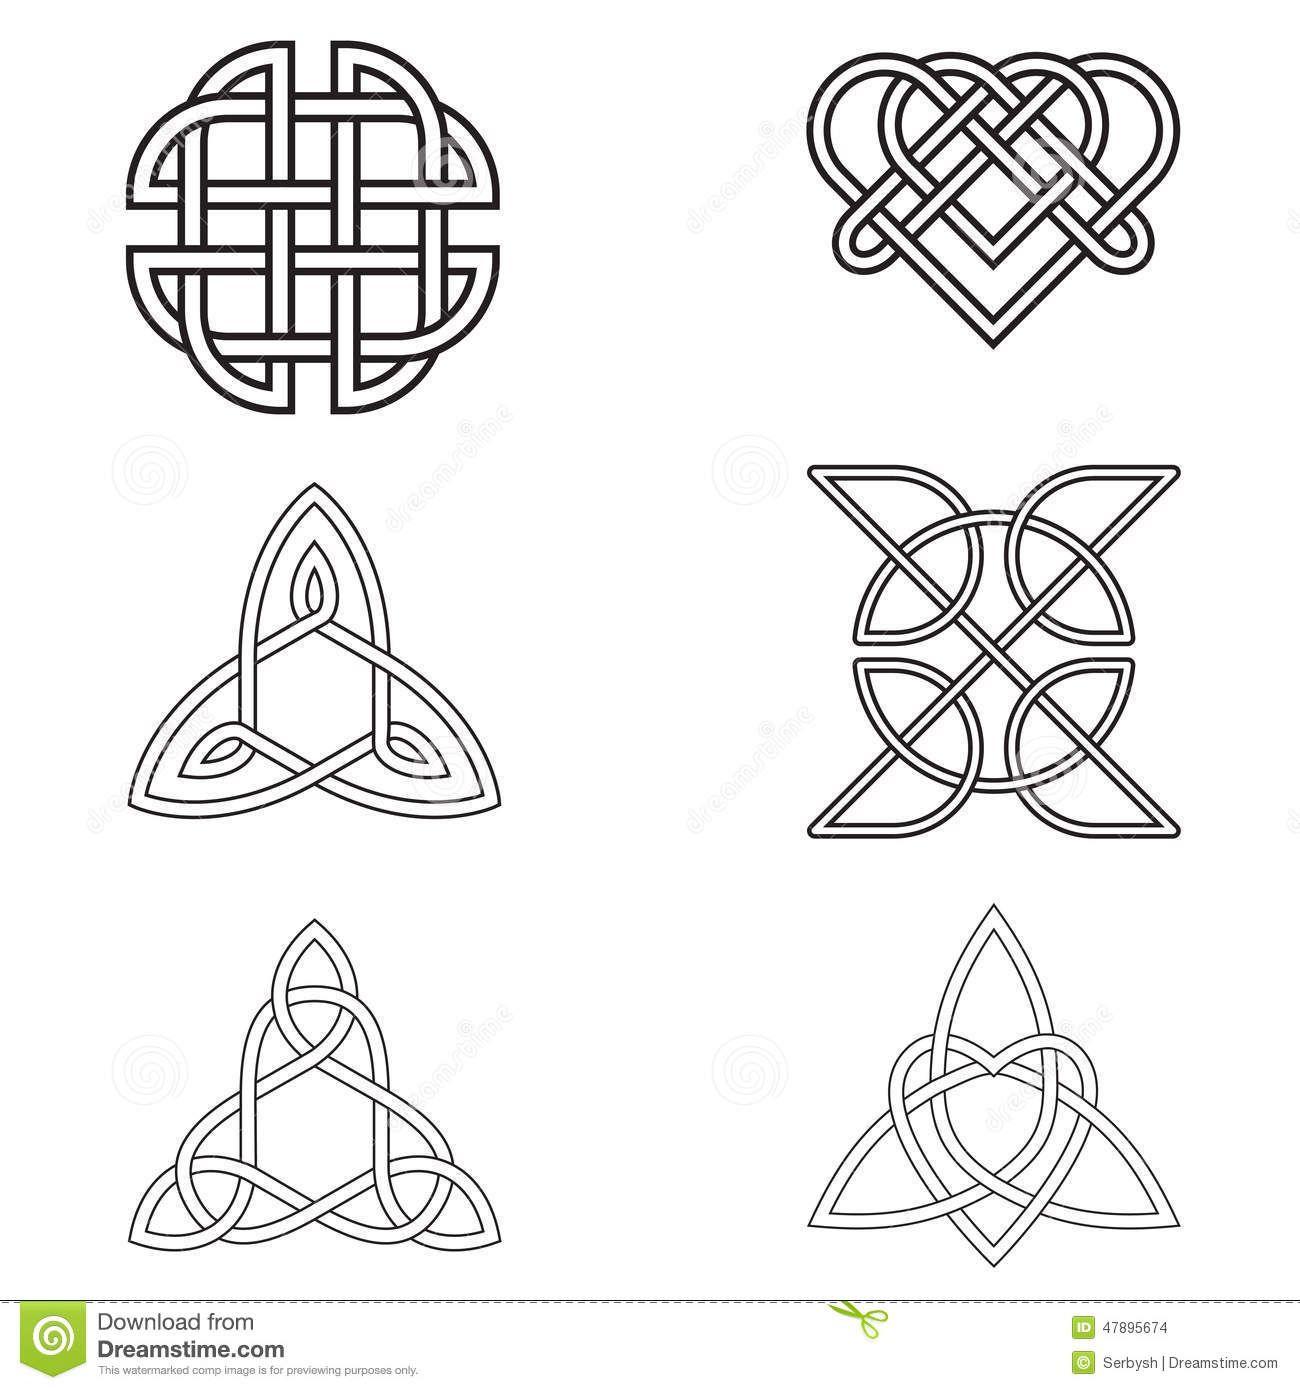 Simbolo Do Amor Eterno Pesquisa Google Tatuajes Celtas Simbolos Celtas Disenos De Unas